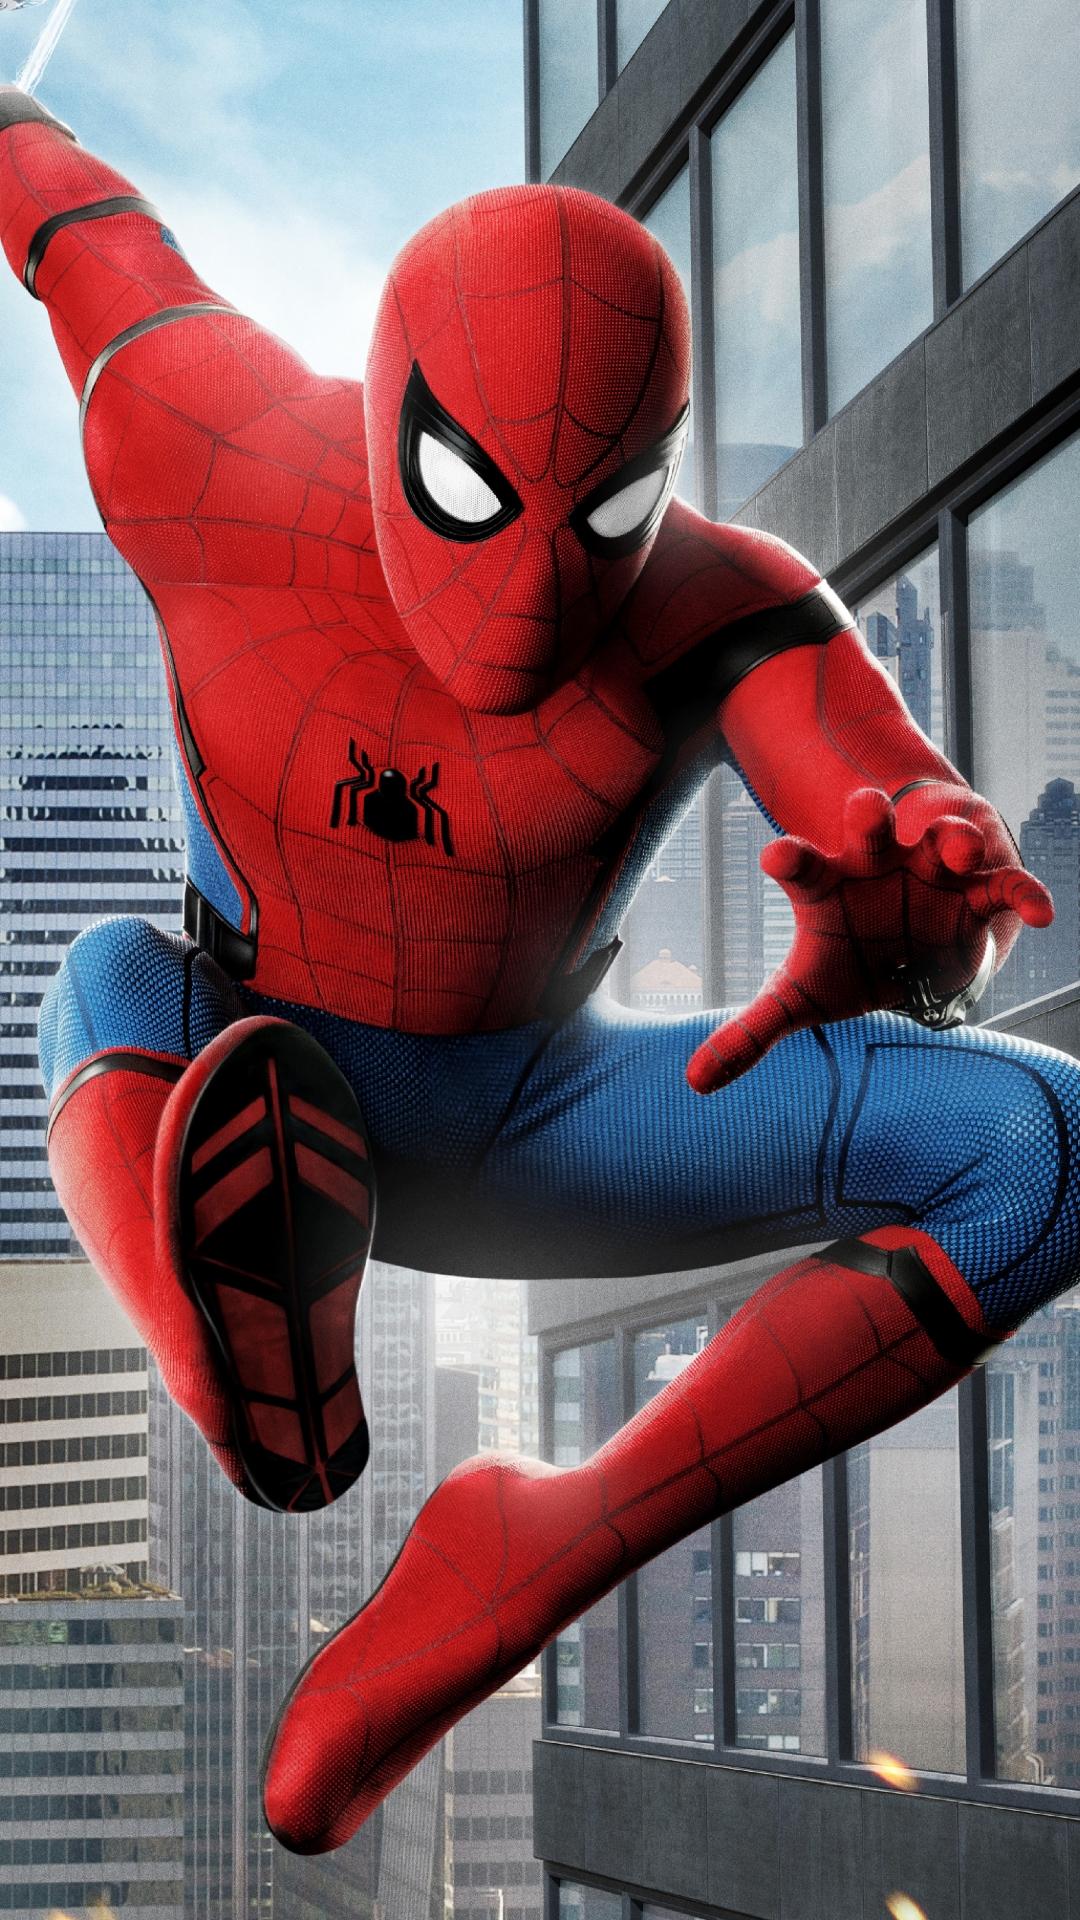 MovieSpider Man Homecoming 1080x1920 Wallpaper ID 685322 1080x1920